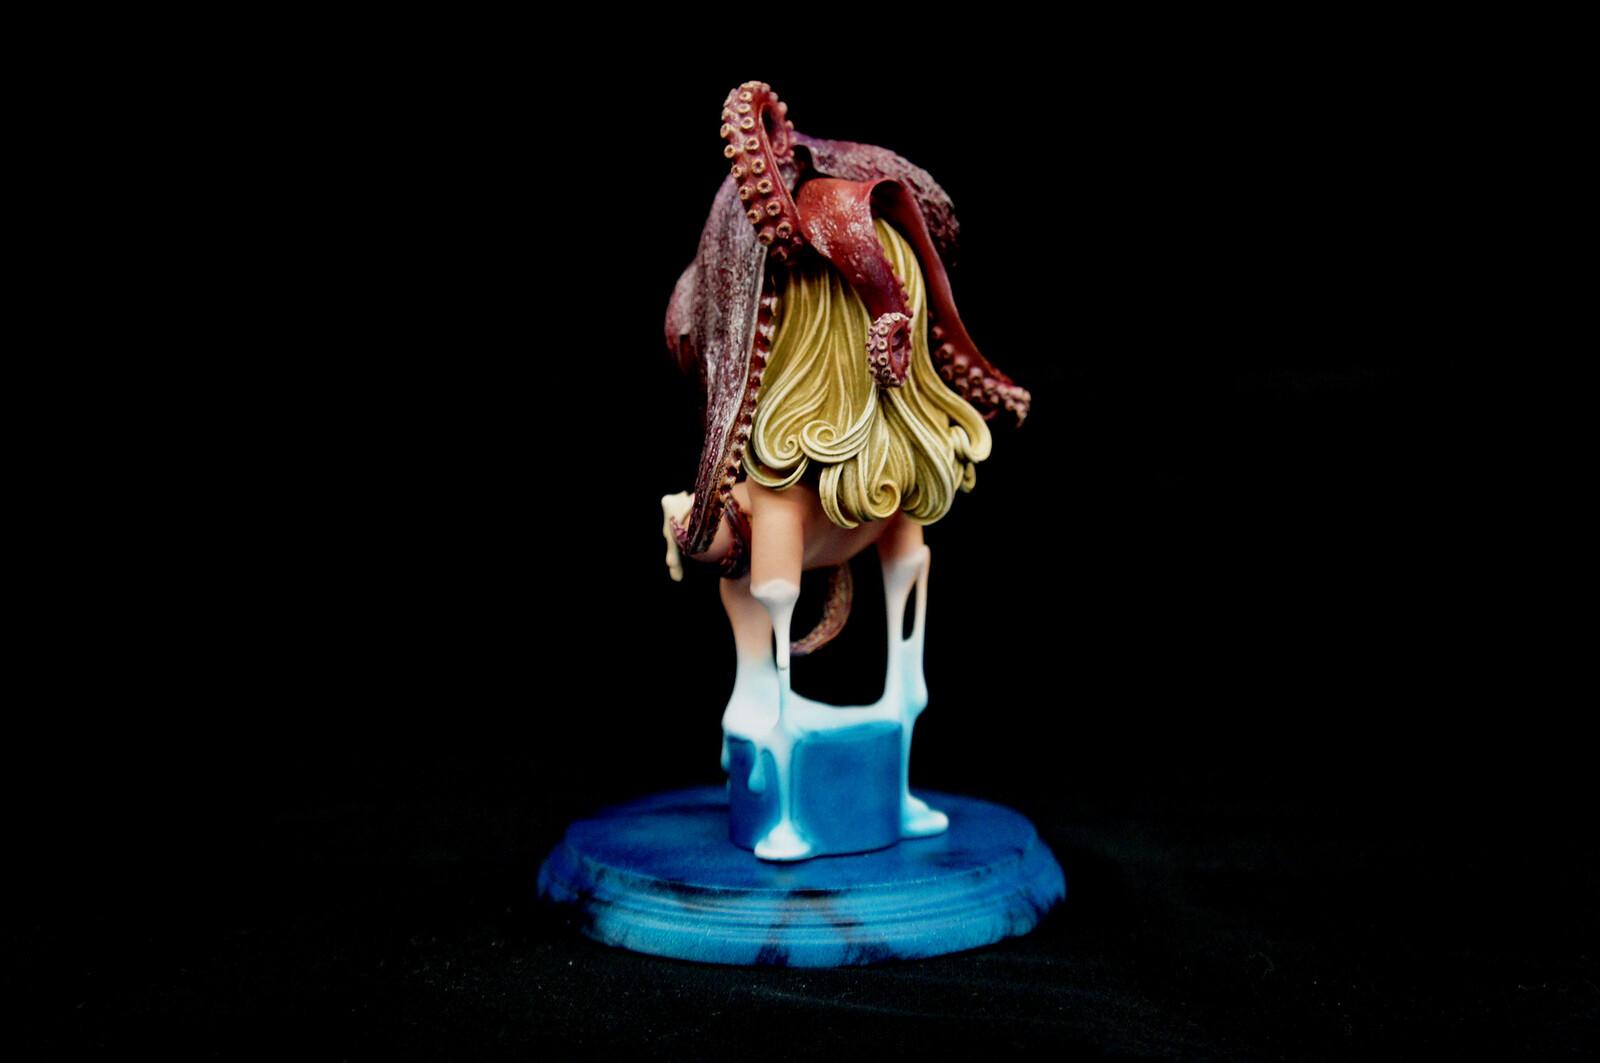 Sorrow Octopus  Art Statue  哀ちゃん